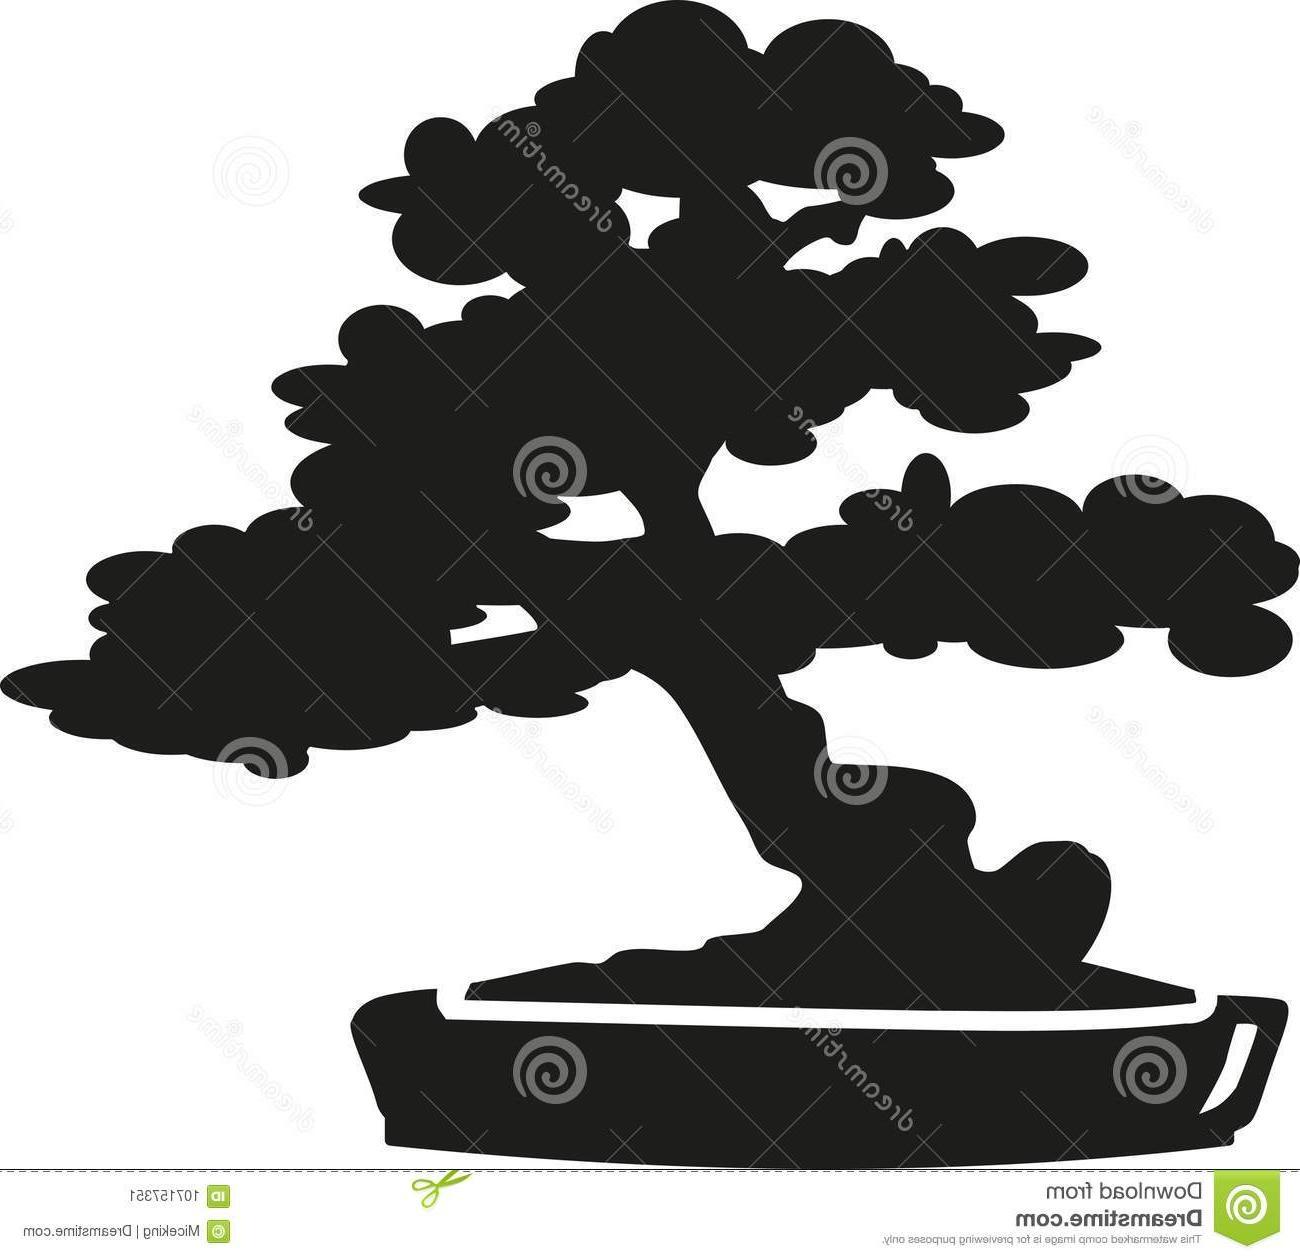 Bonsai tree silhouette clipart free Top Bonsai Tree Silhouette Vector Cdr » Free Vector Art, Images ... free